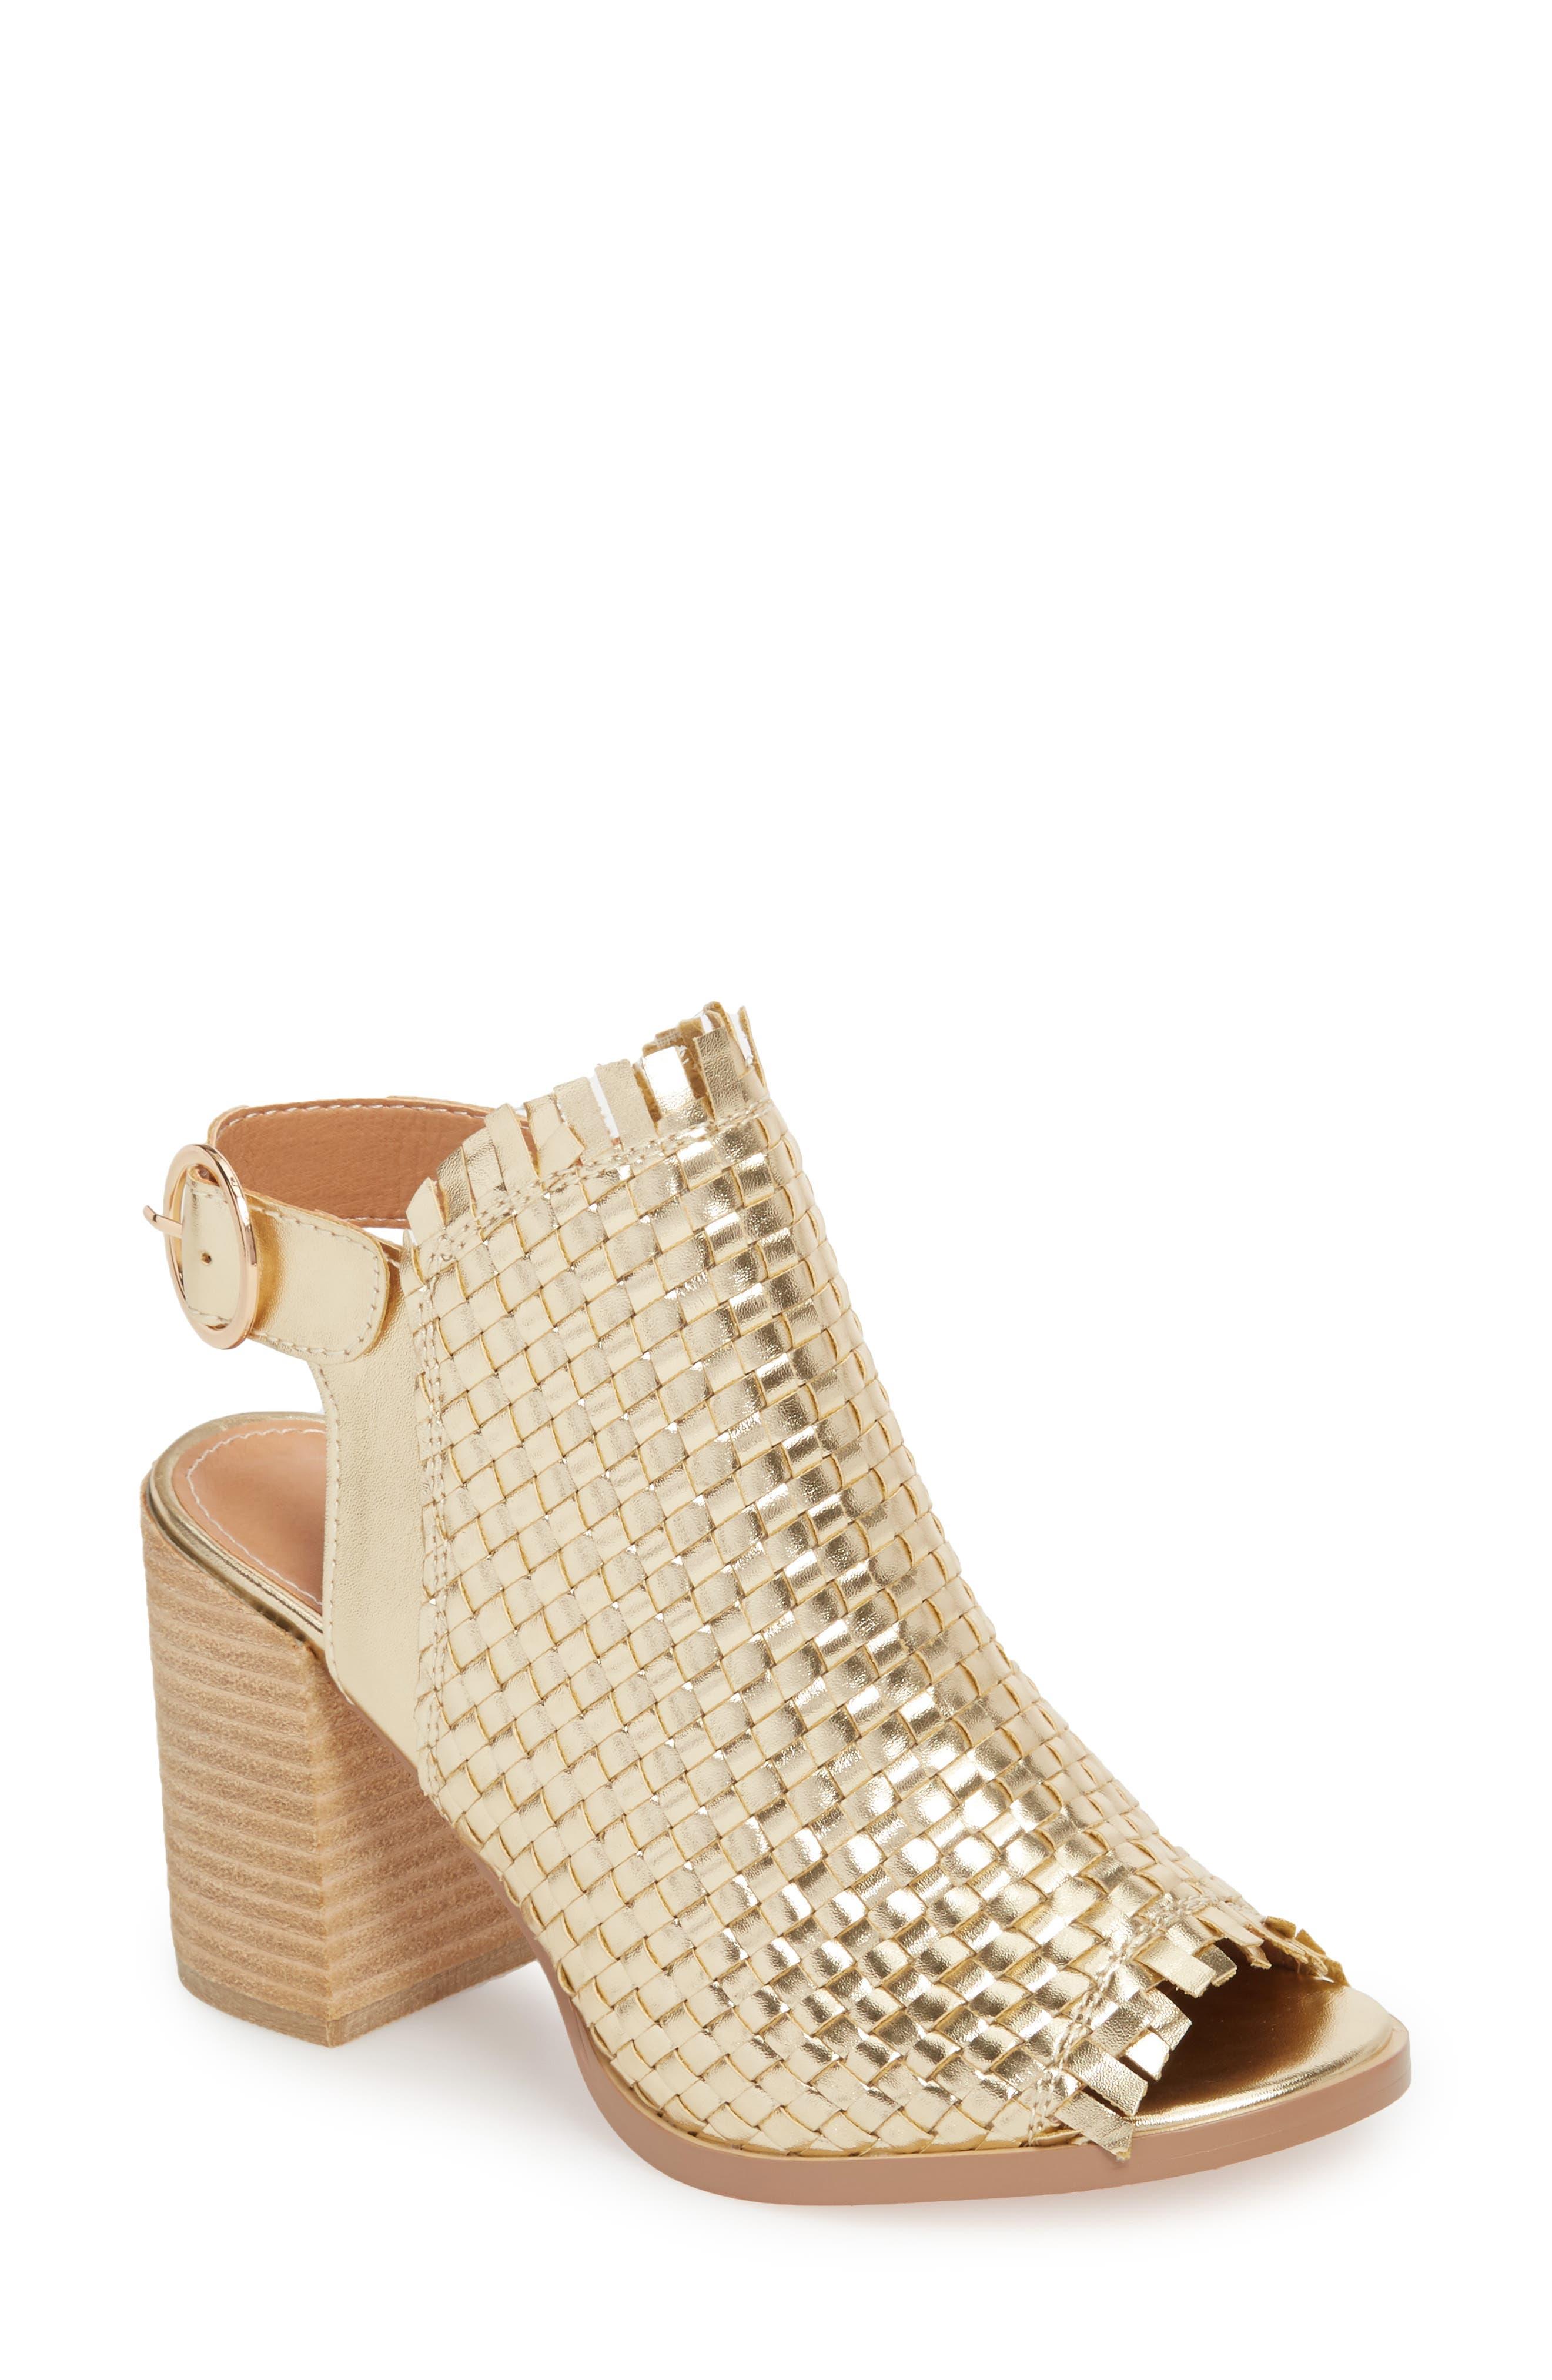 826a53590 Women s Very Volatile Sandals